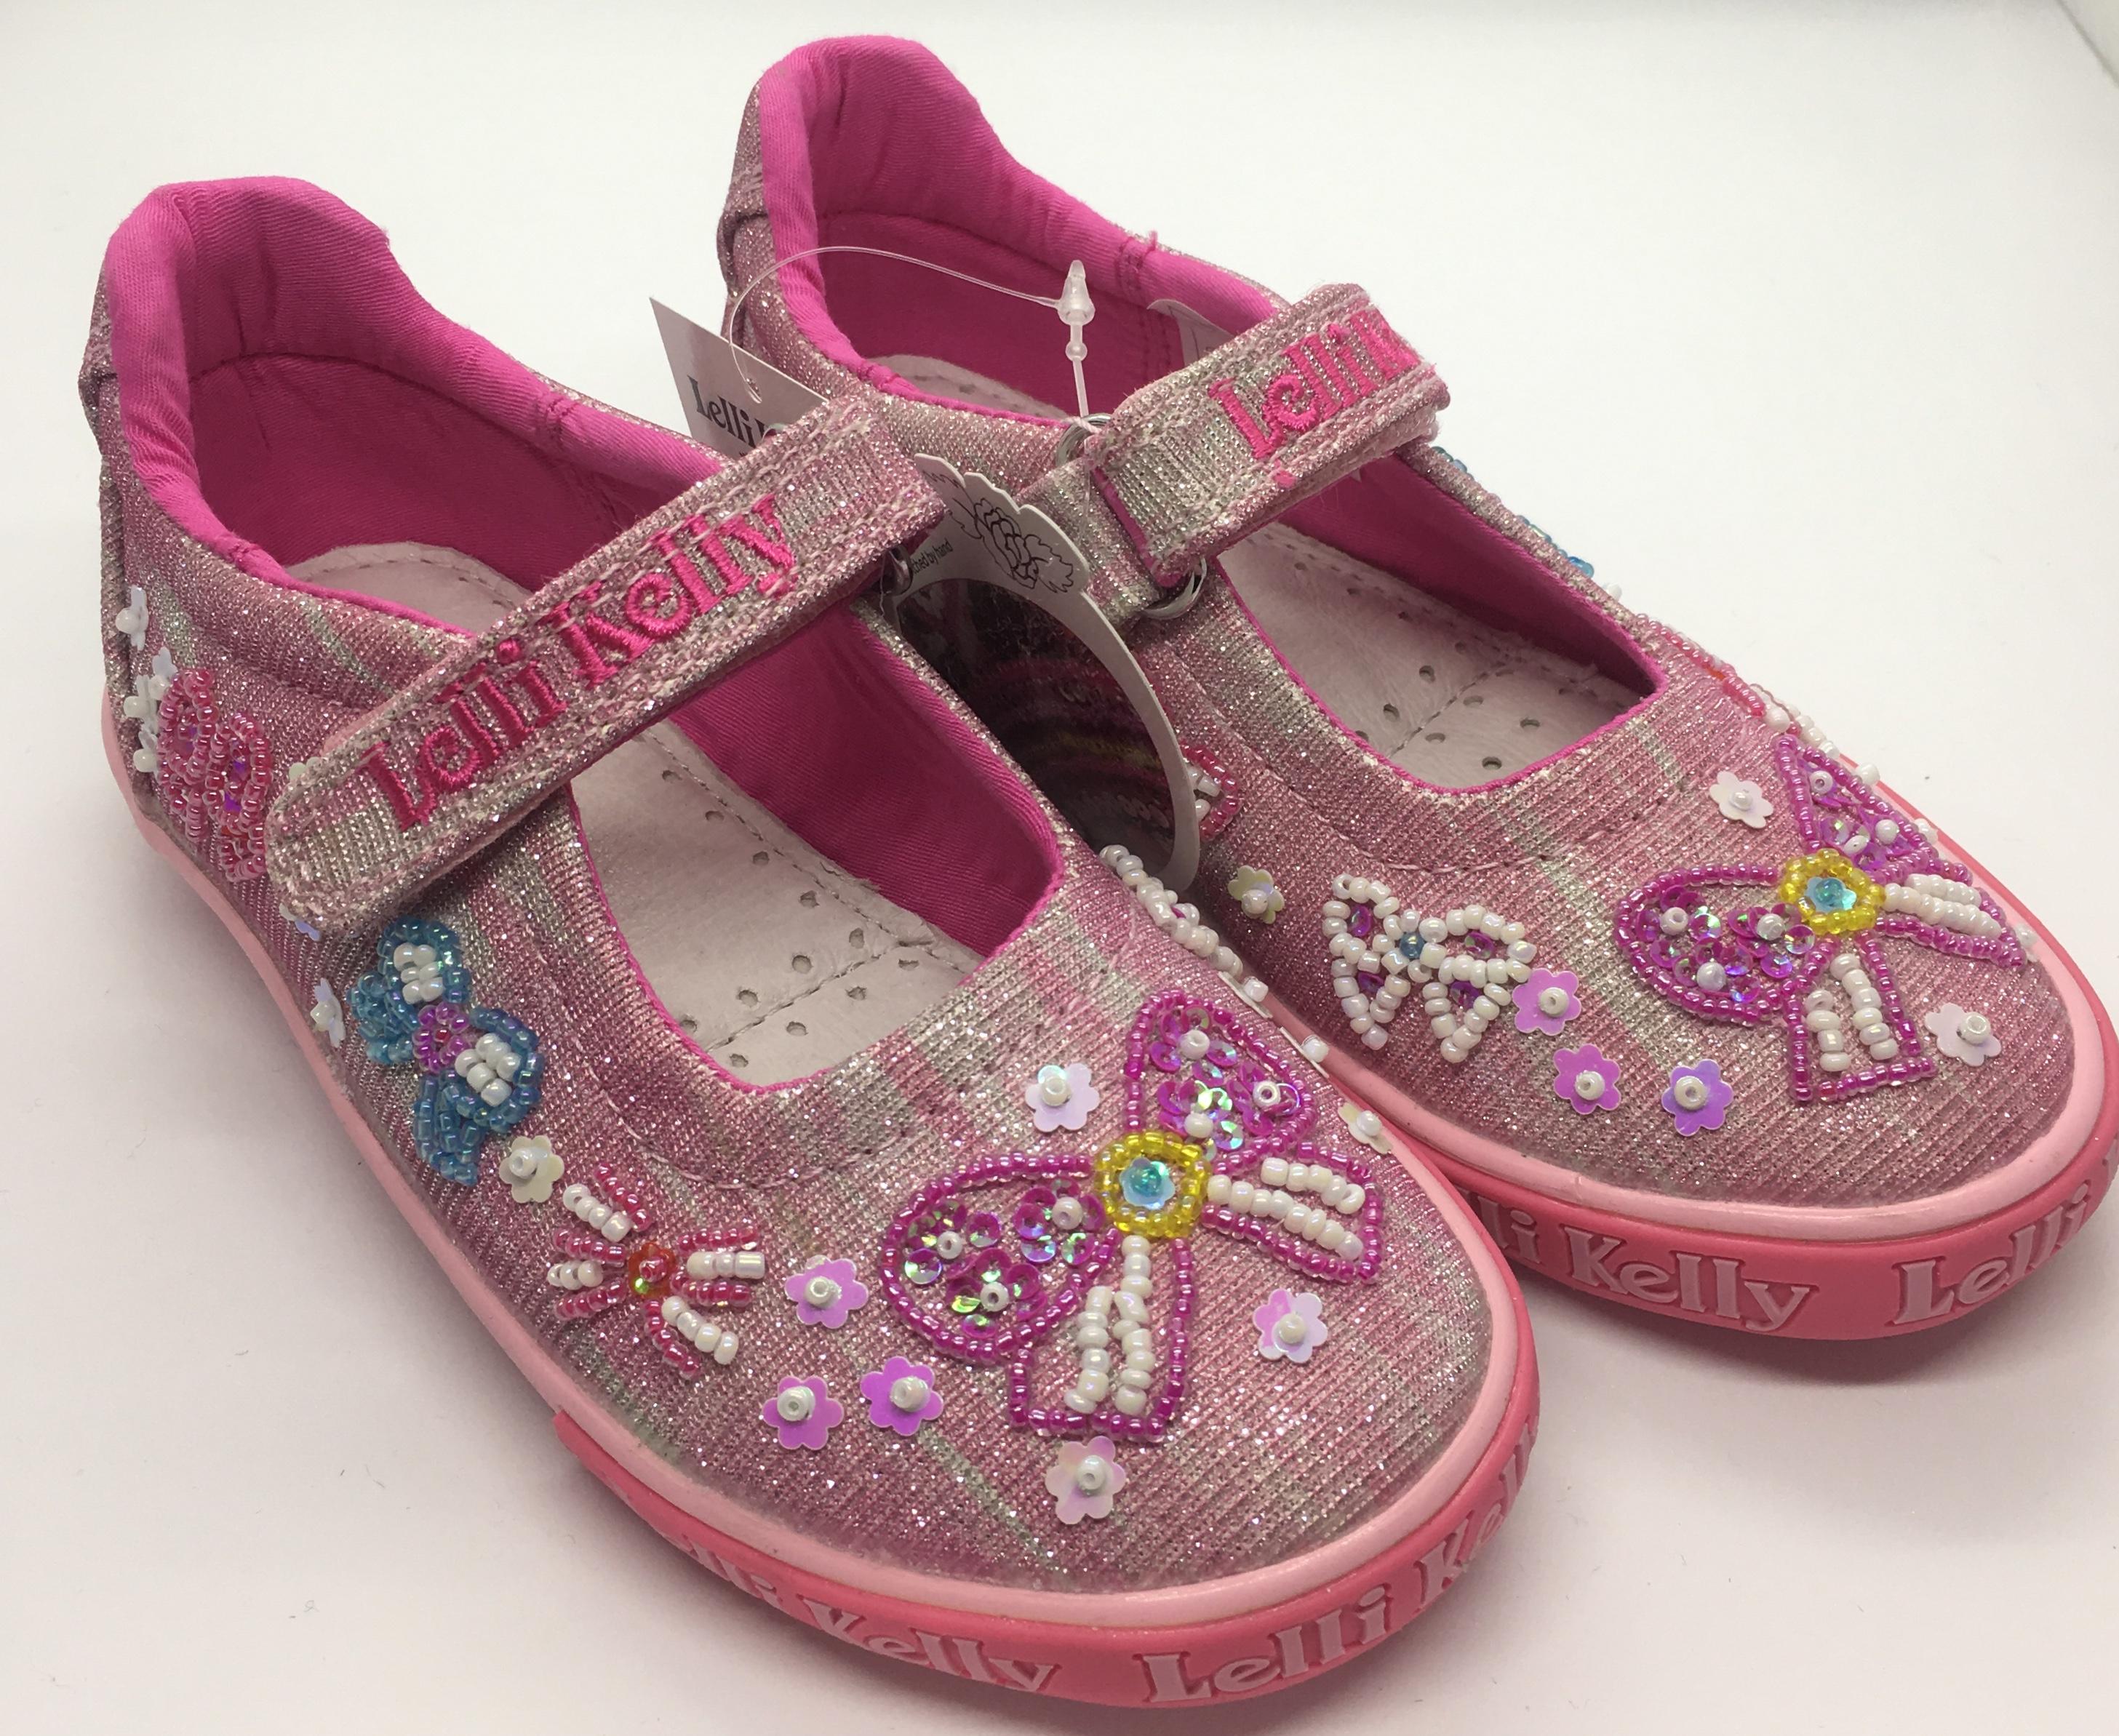 3e0edb9cc82fe Lelli Kelly Shining Bow LK5066 Dolly Shoe   Shooligans Shoes